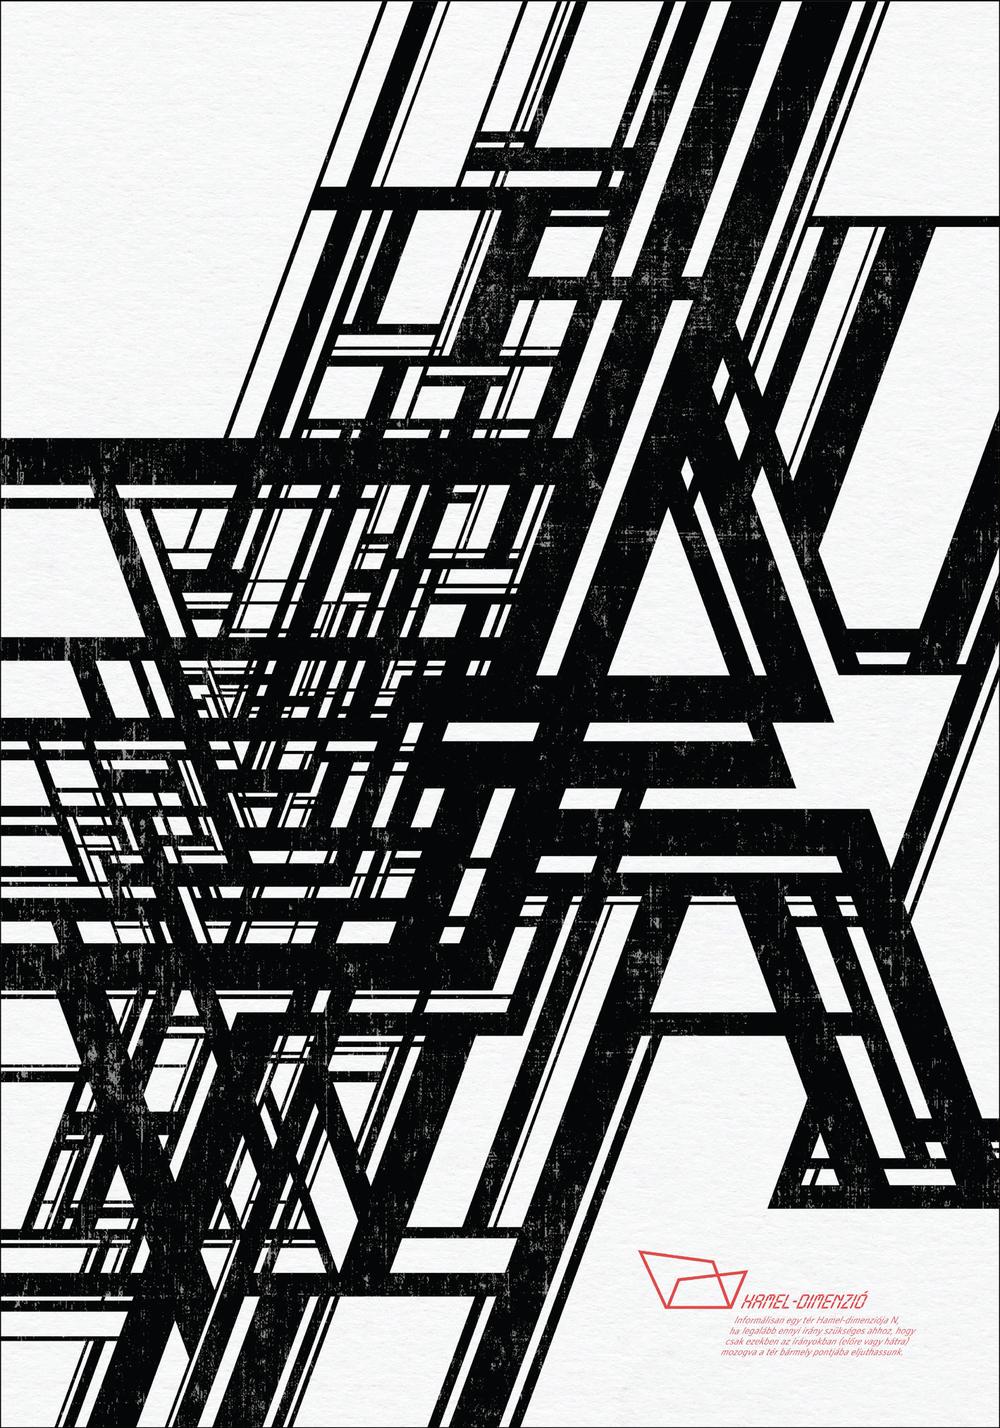 Havasi Zoltán - Hamel dimenzió